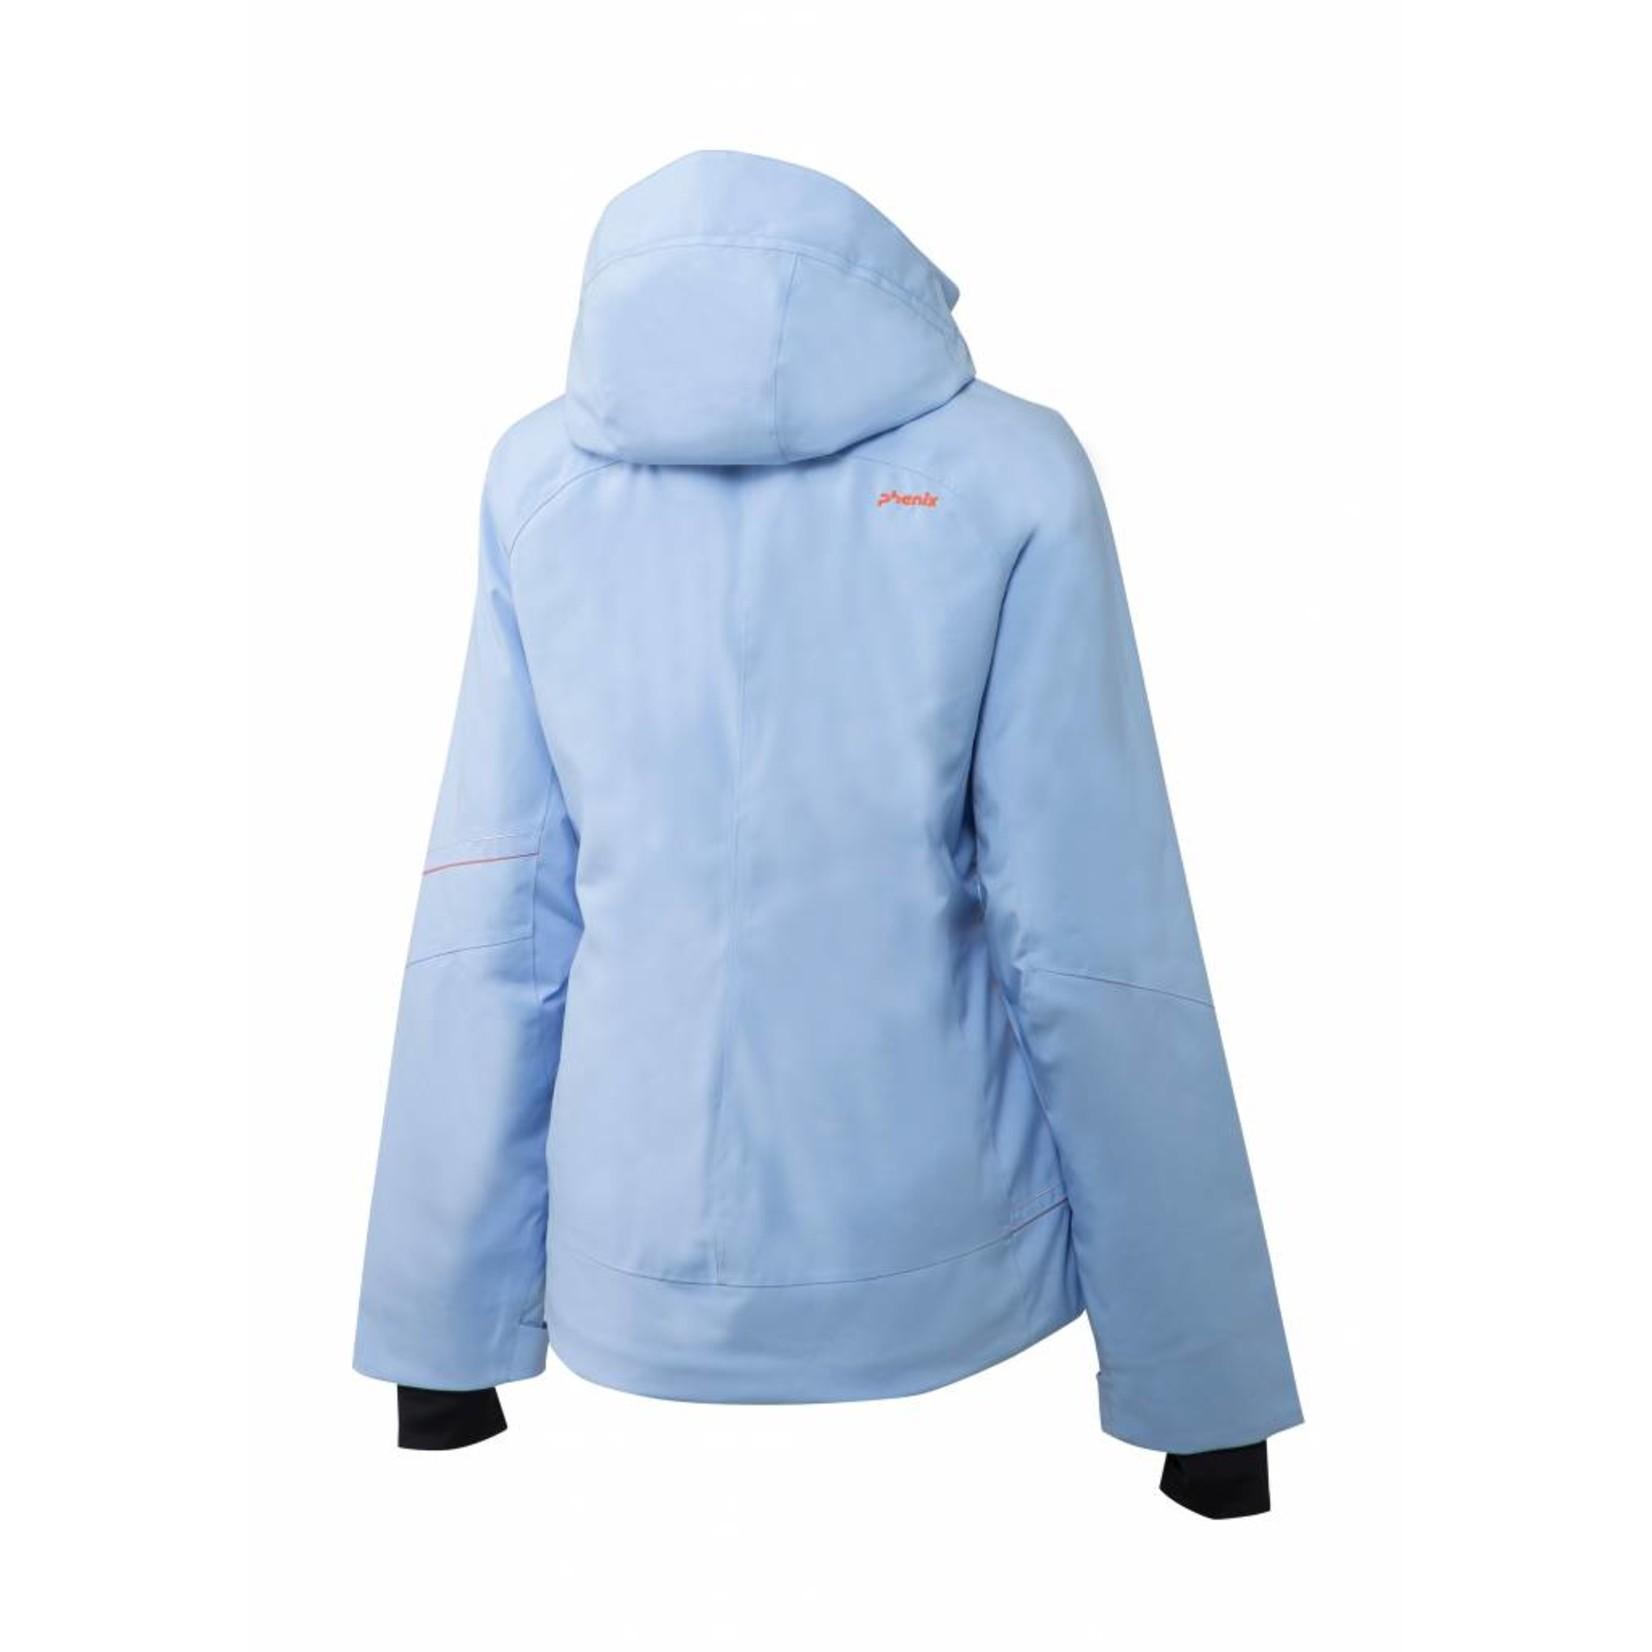 PHENIX Grant Jacket